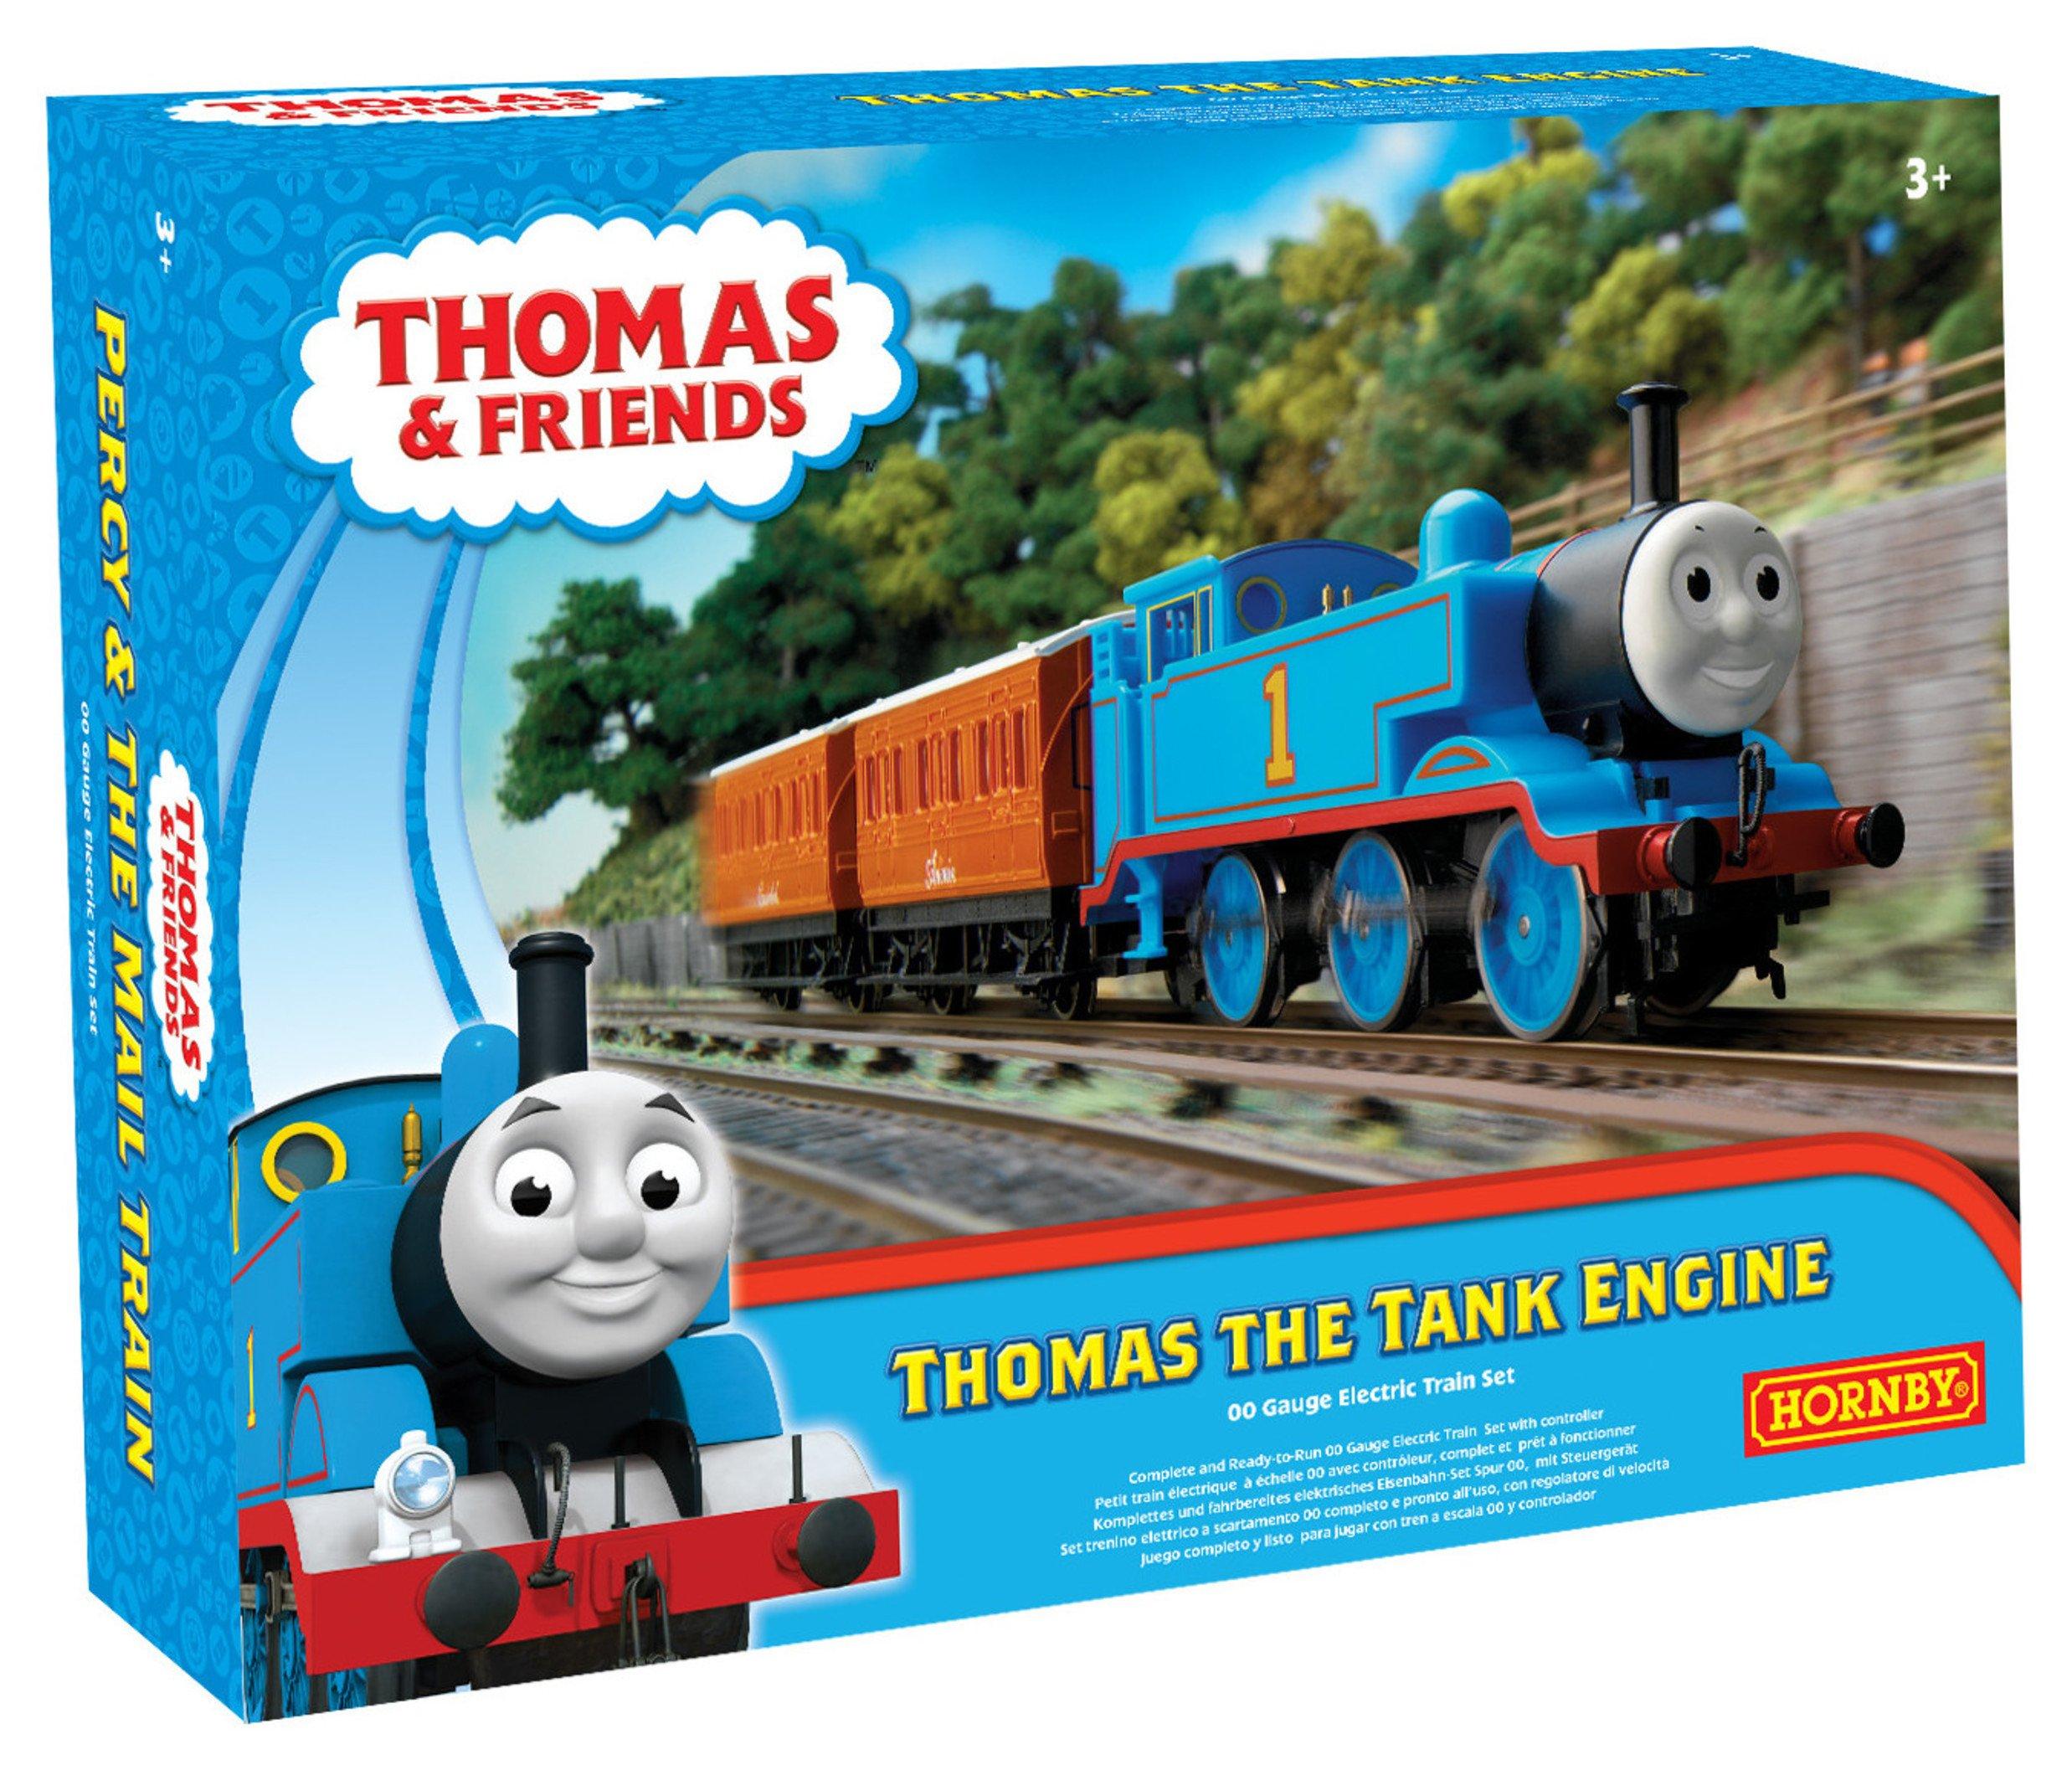 Hornby Thomas & Friends Train Set